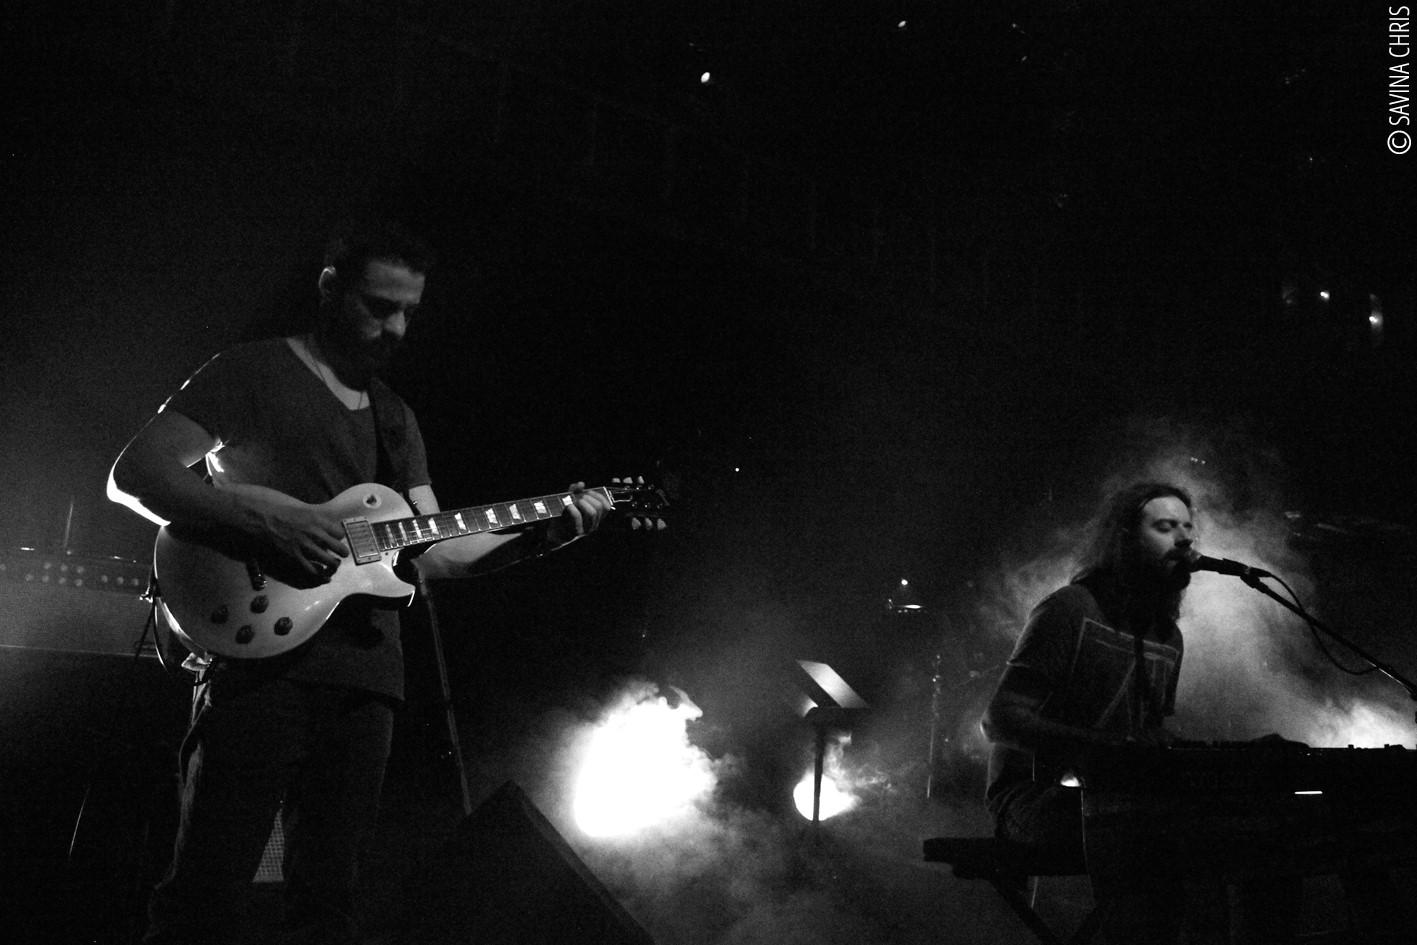 Moonlight Overdrive live@stn